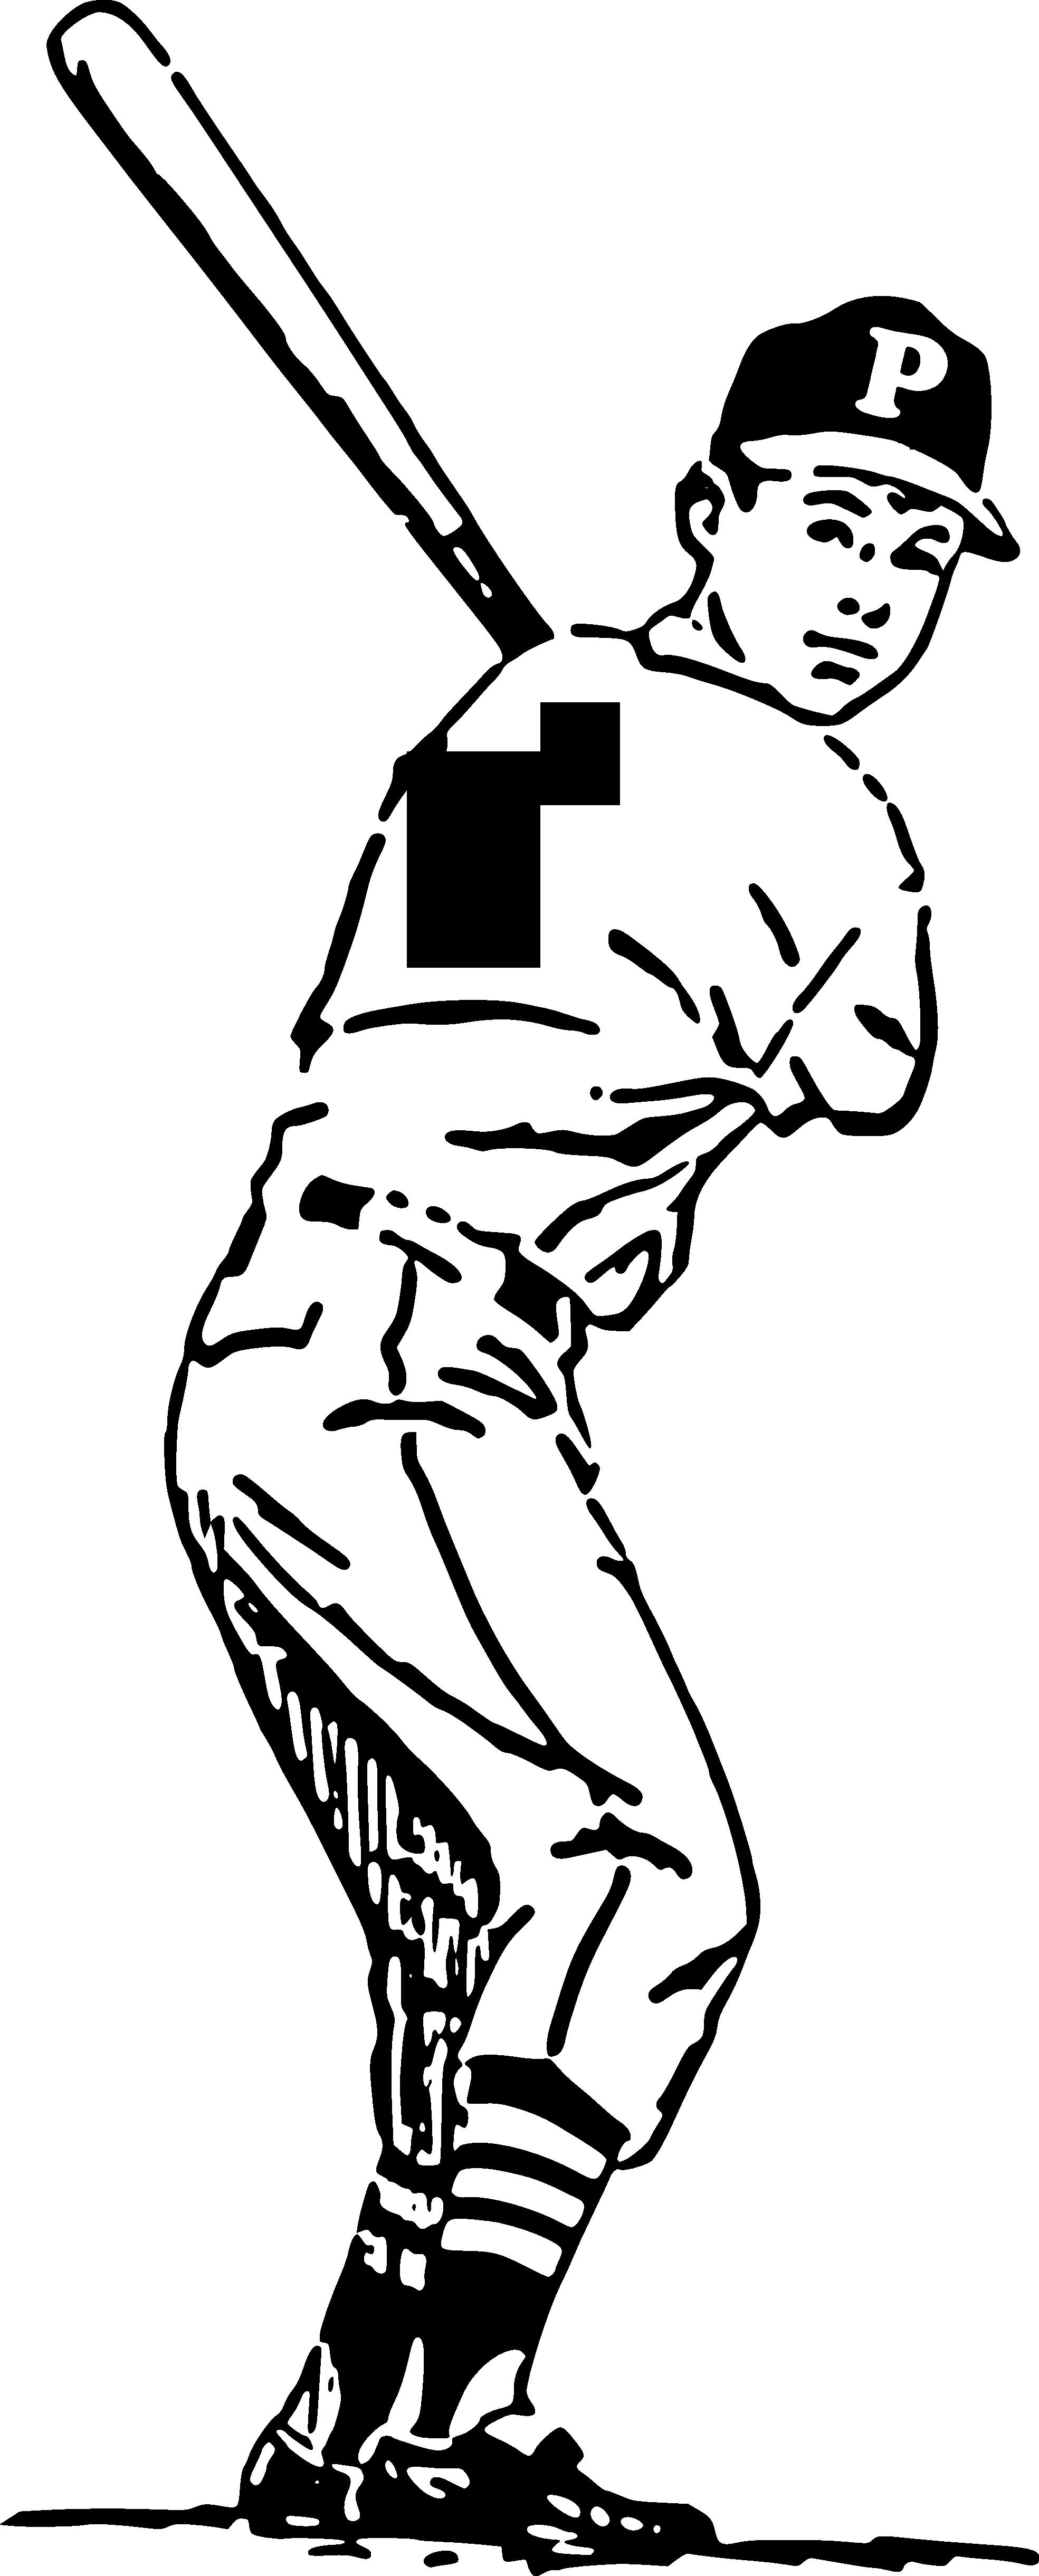 vector transparent Closet clipart black and white. Baseball player batter swinging